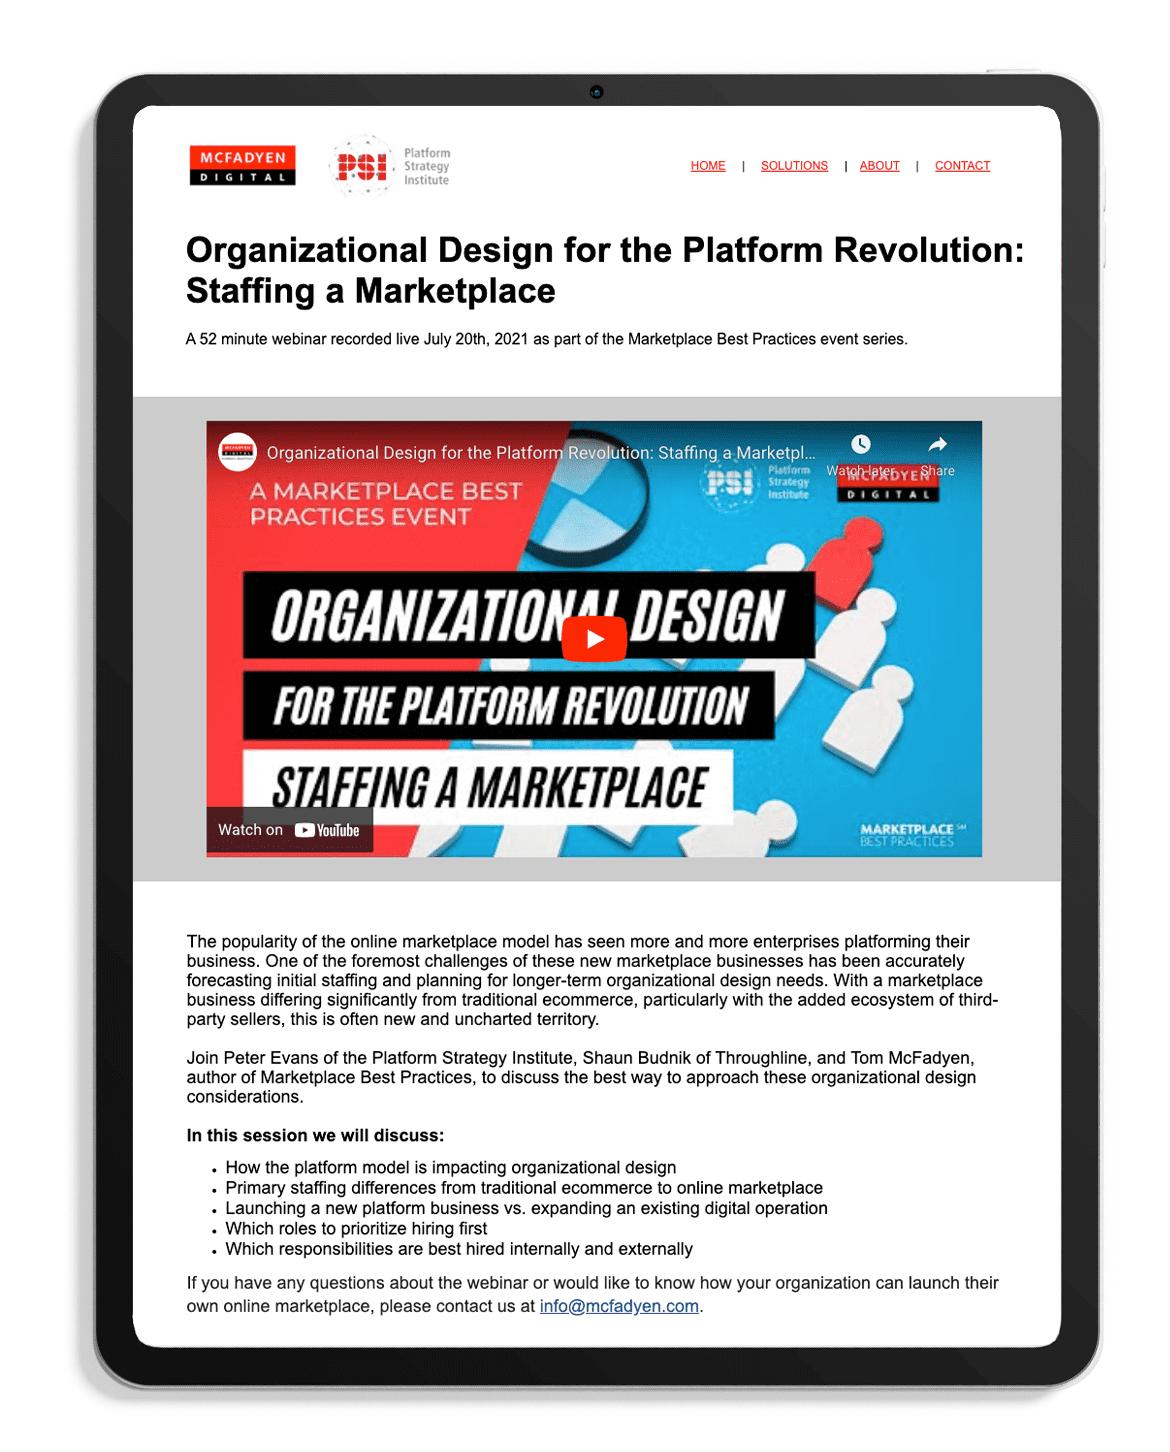 Organizational Design for the Platform Revolution